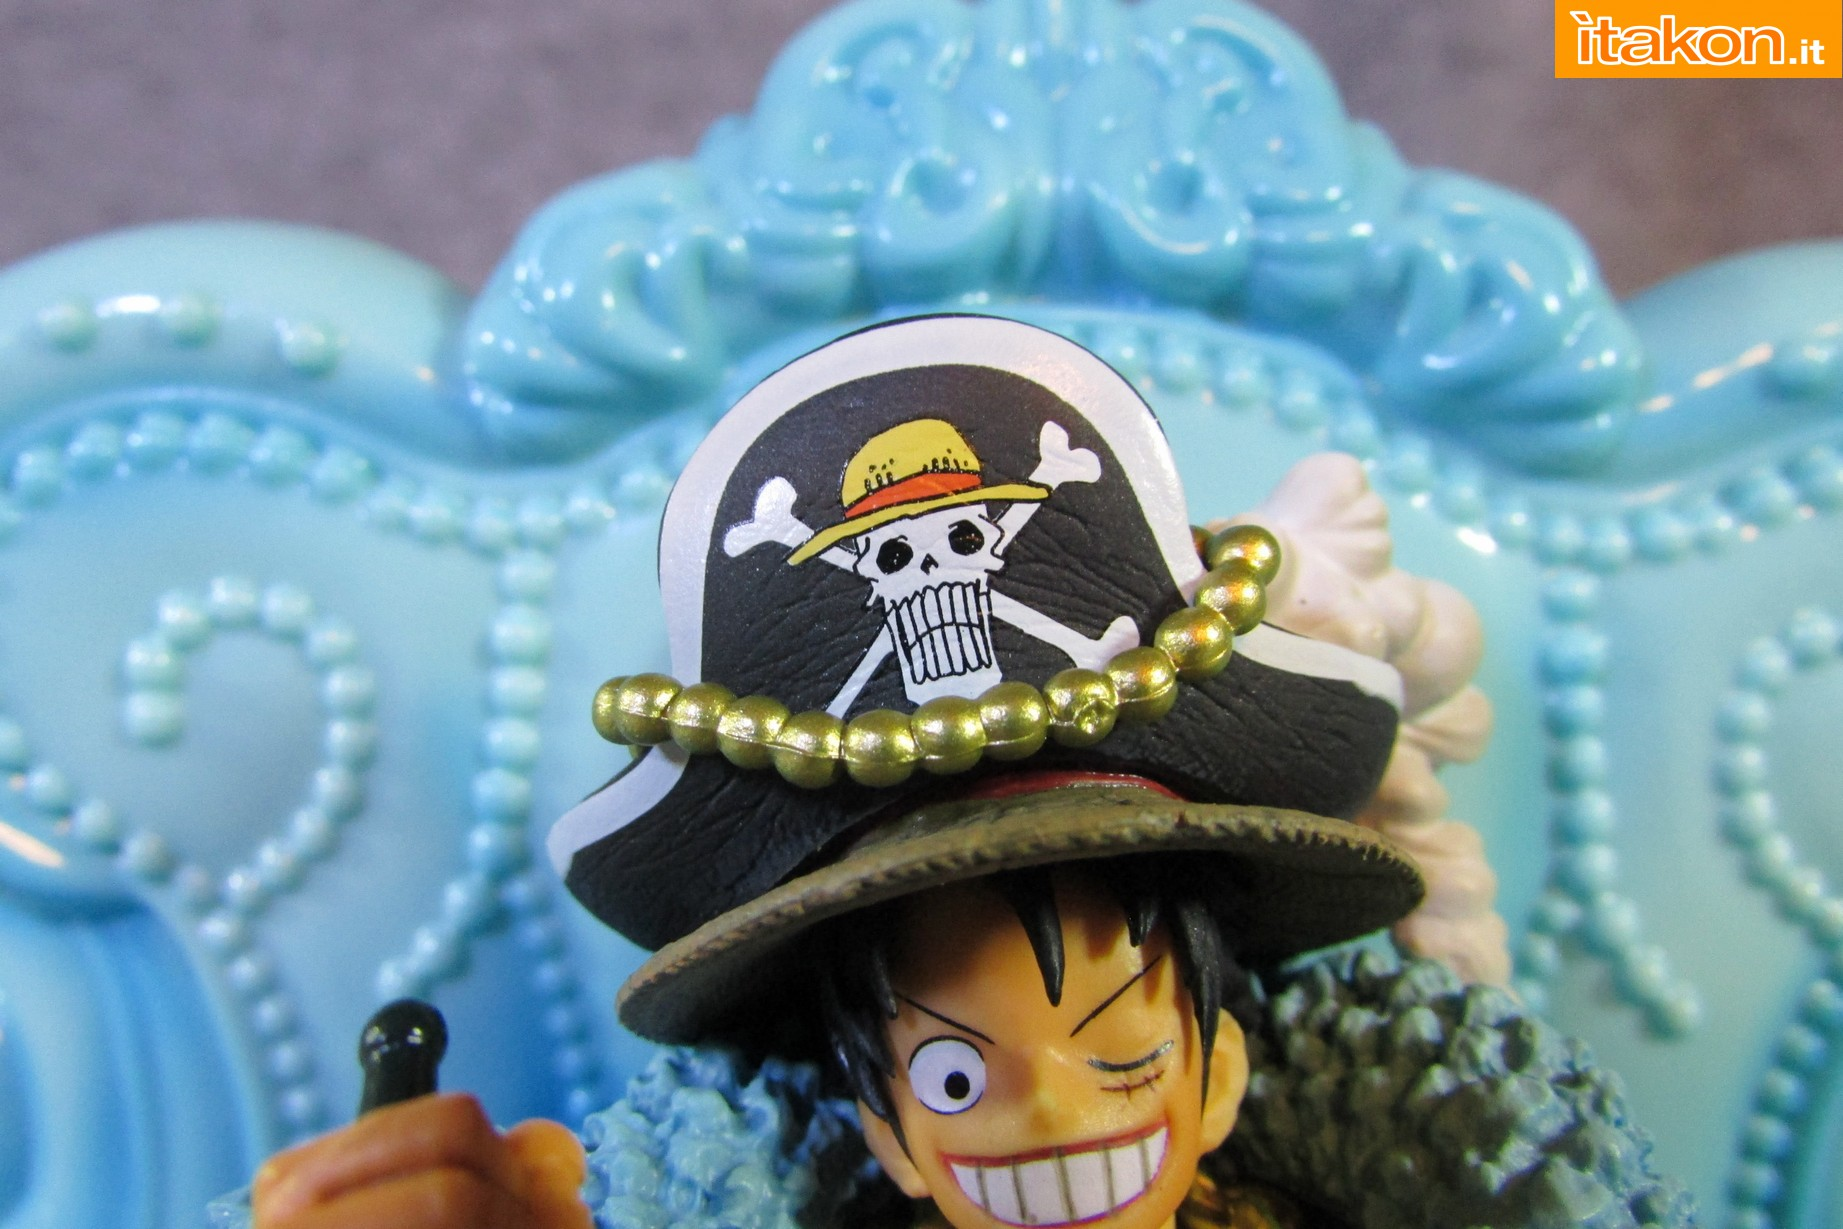 Link a Recensione Review Monkey D. Luffy One Piece 20th Anniversary ver. Figuarts ZERO di Bandai 15